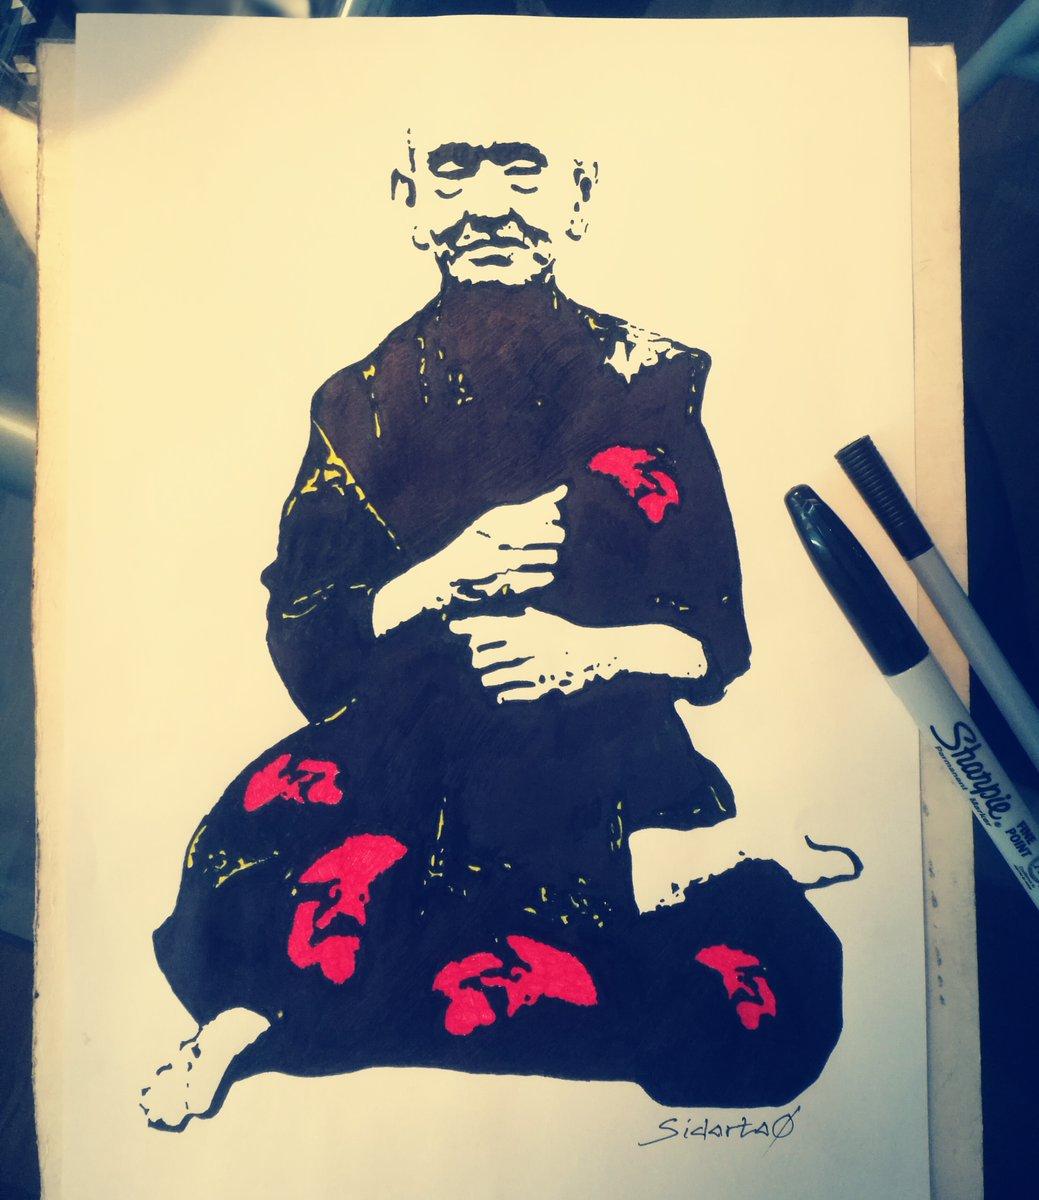 :THE BIRTH: Let The Magic Begin #society #art #banksyartpic.twitter.com/lkvBu3CHUd